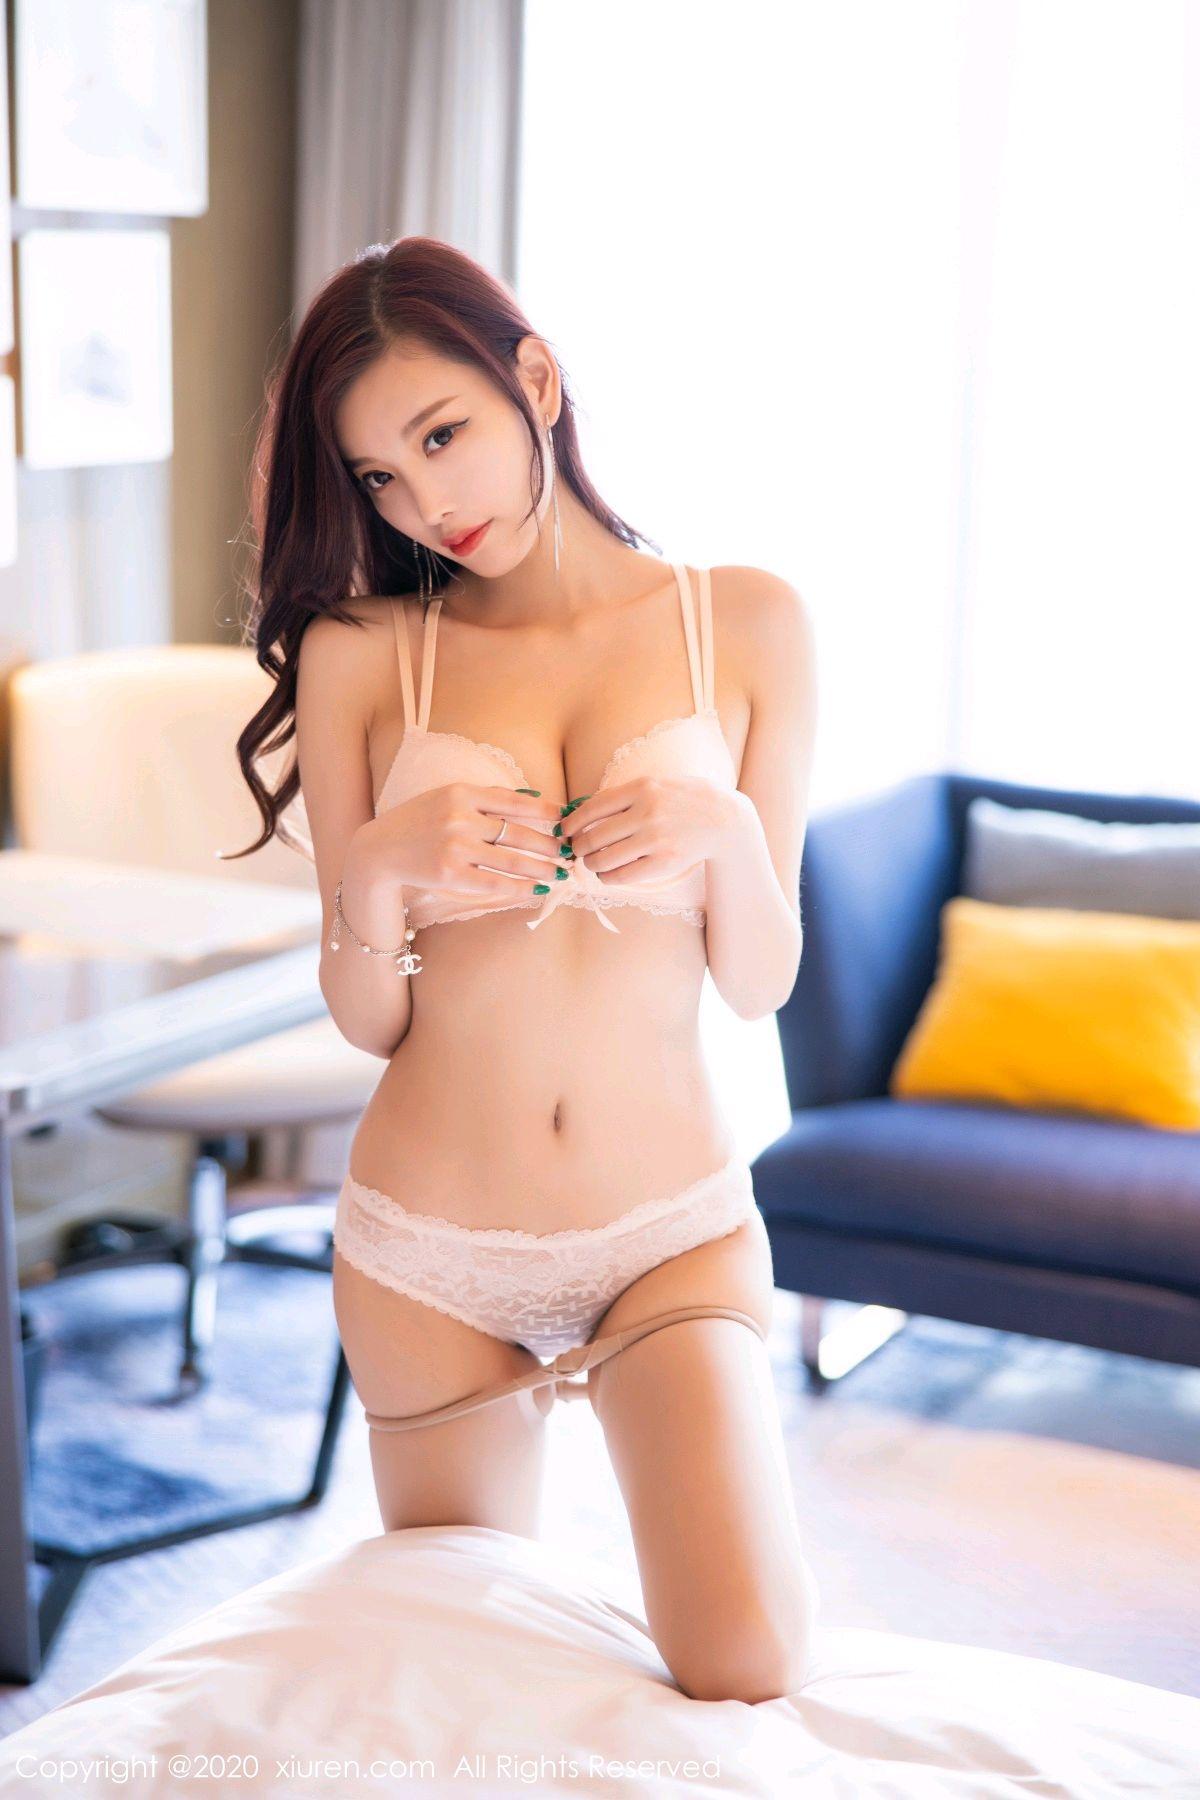 [XiuRen] Vol.2431 Yang Chen Chen 69P, Tall, Underwear, Uniform, Xiuren, Yang Chen Chen